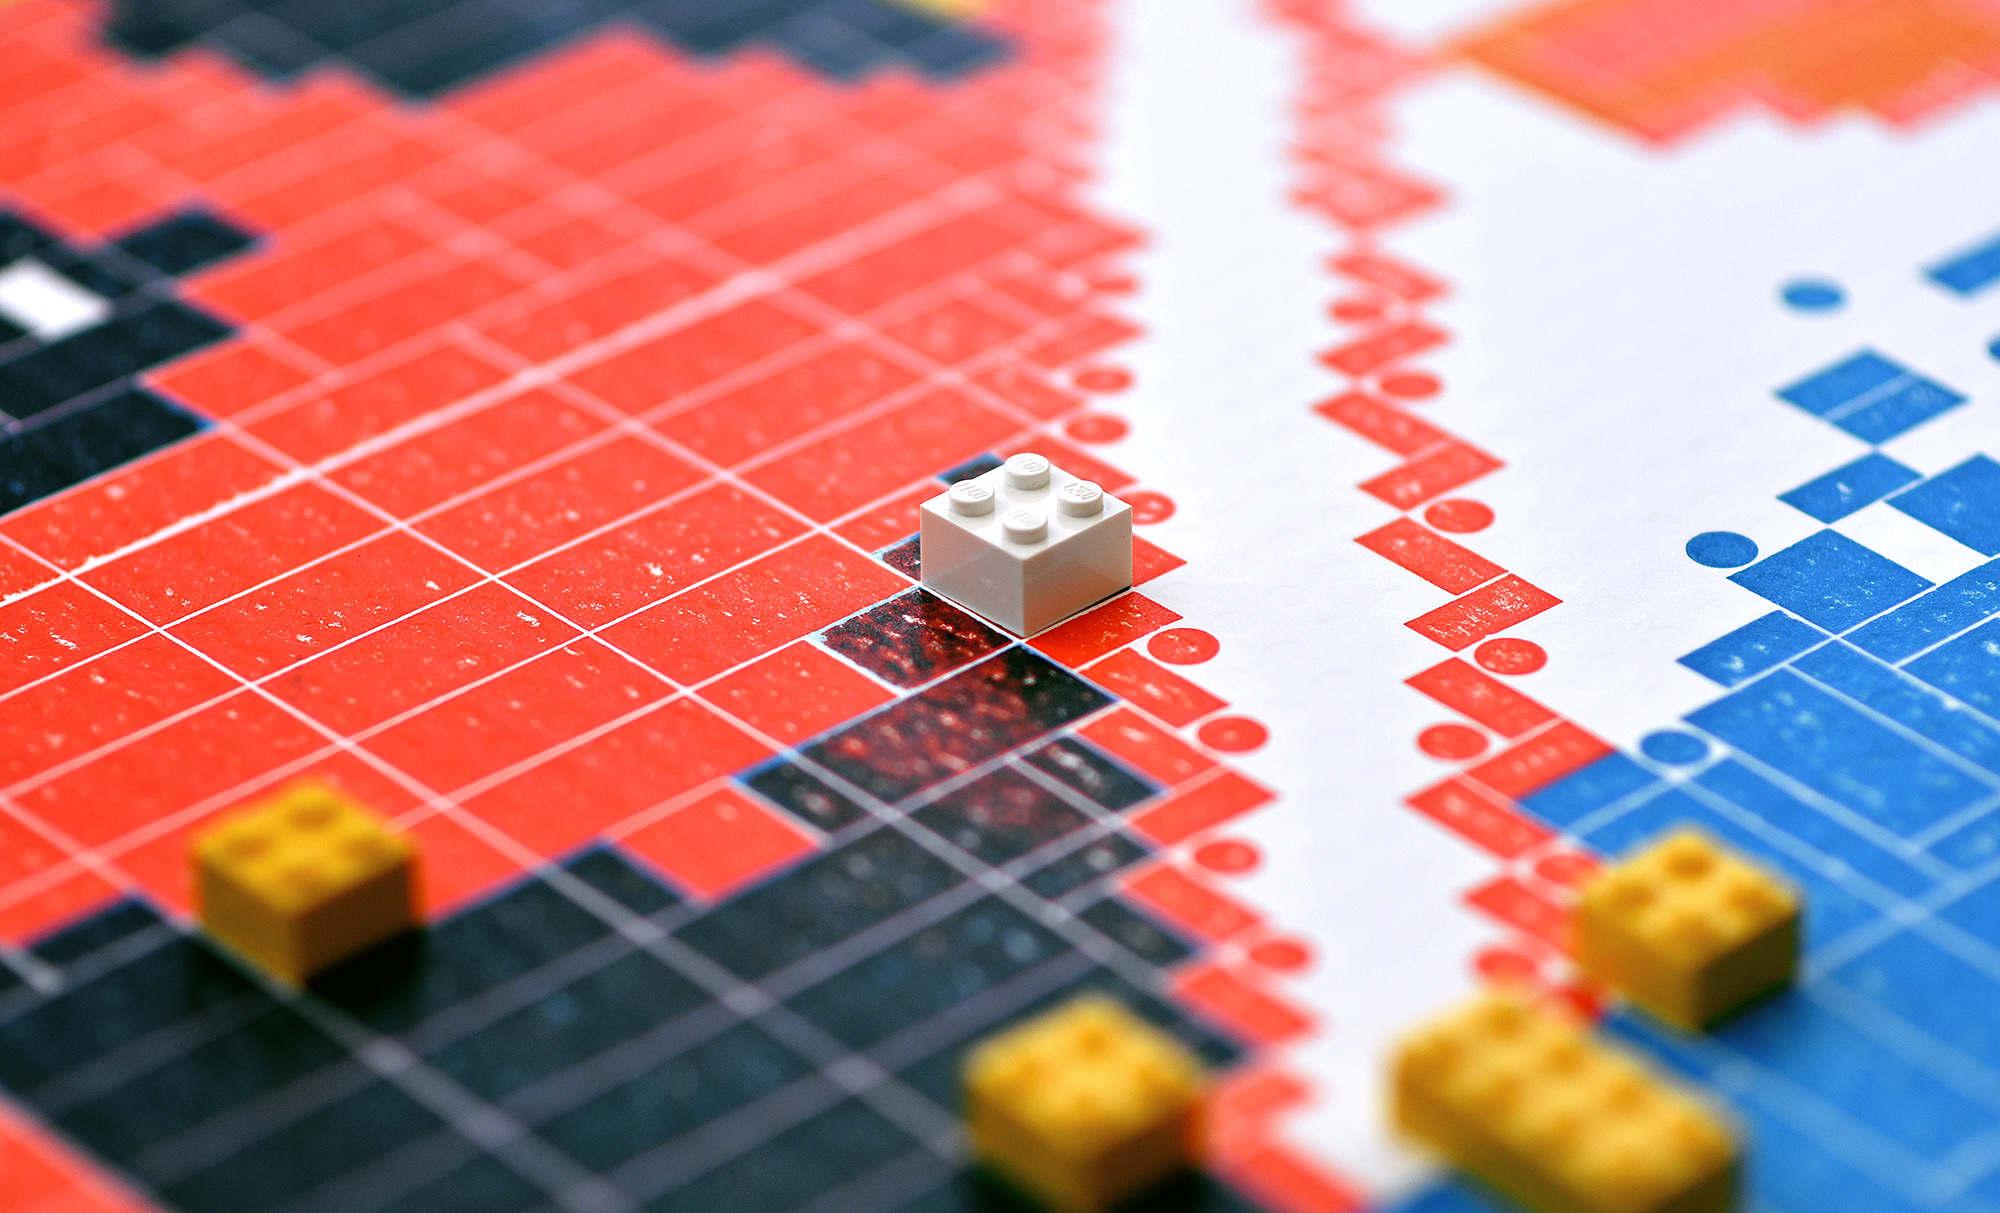 LEGOPRESS_CLOSEUP_02_2000_c.jpg